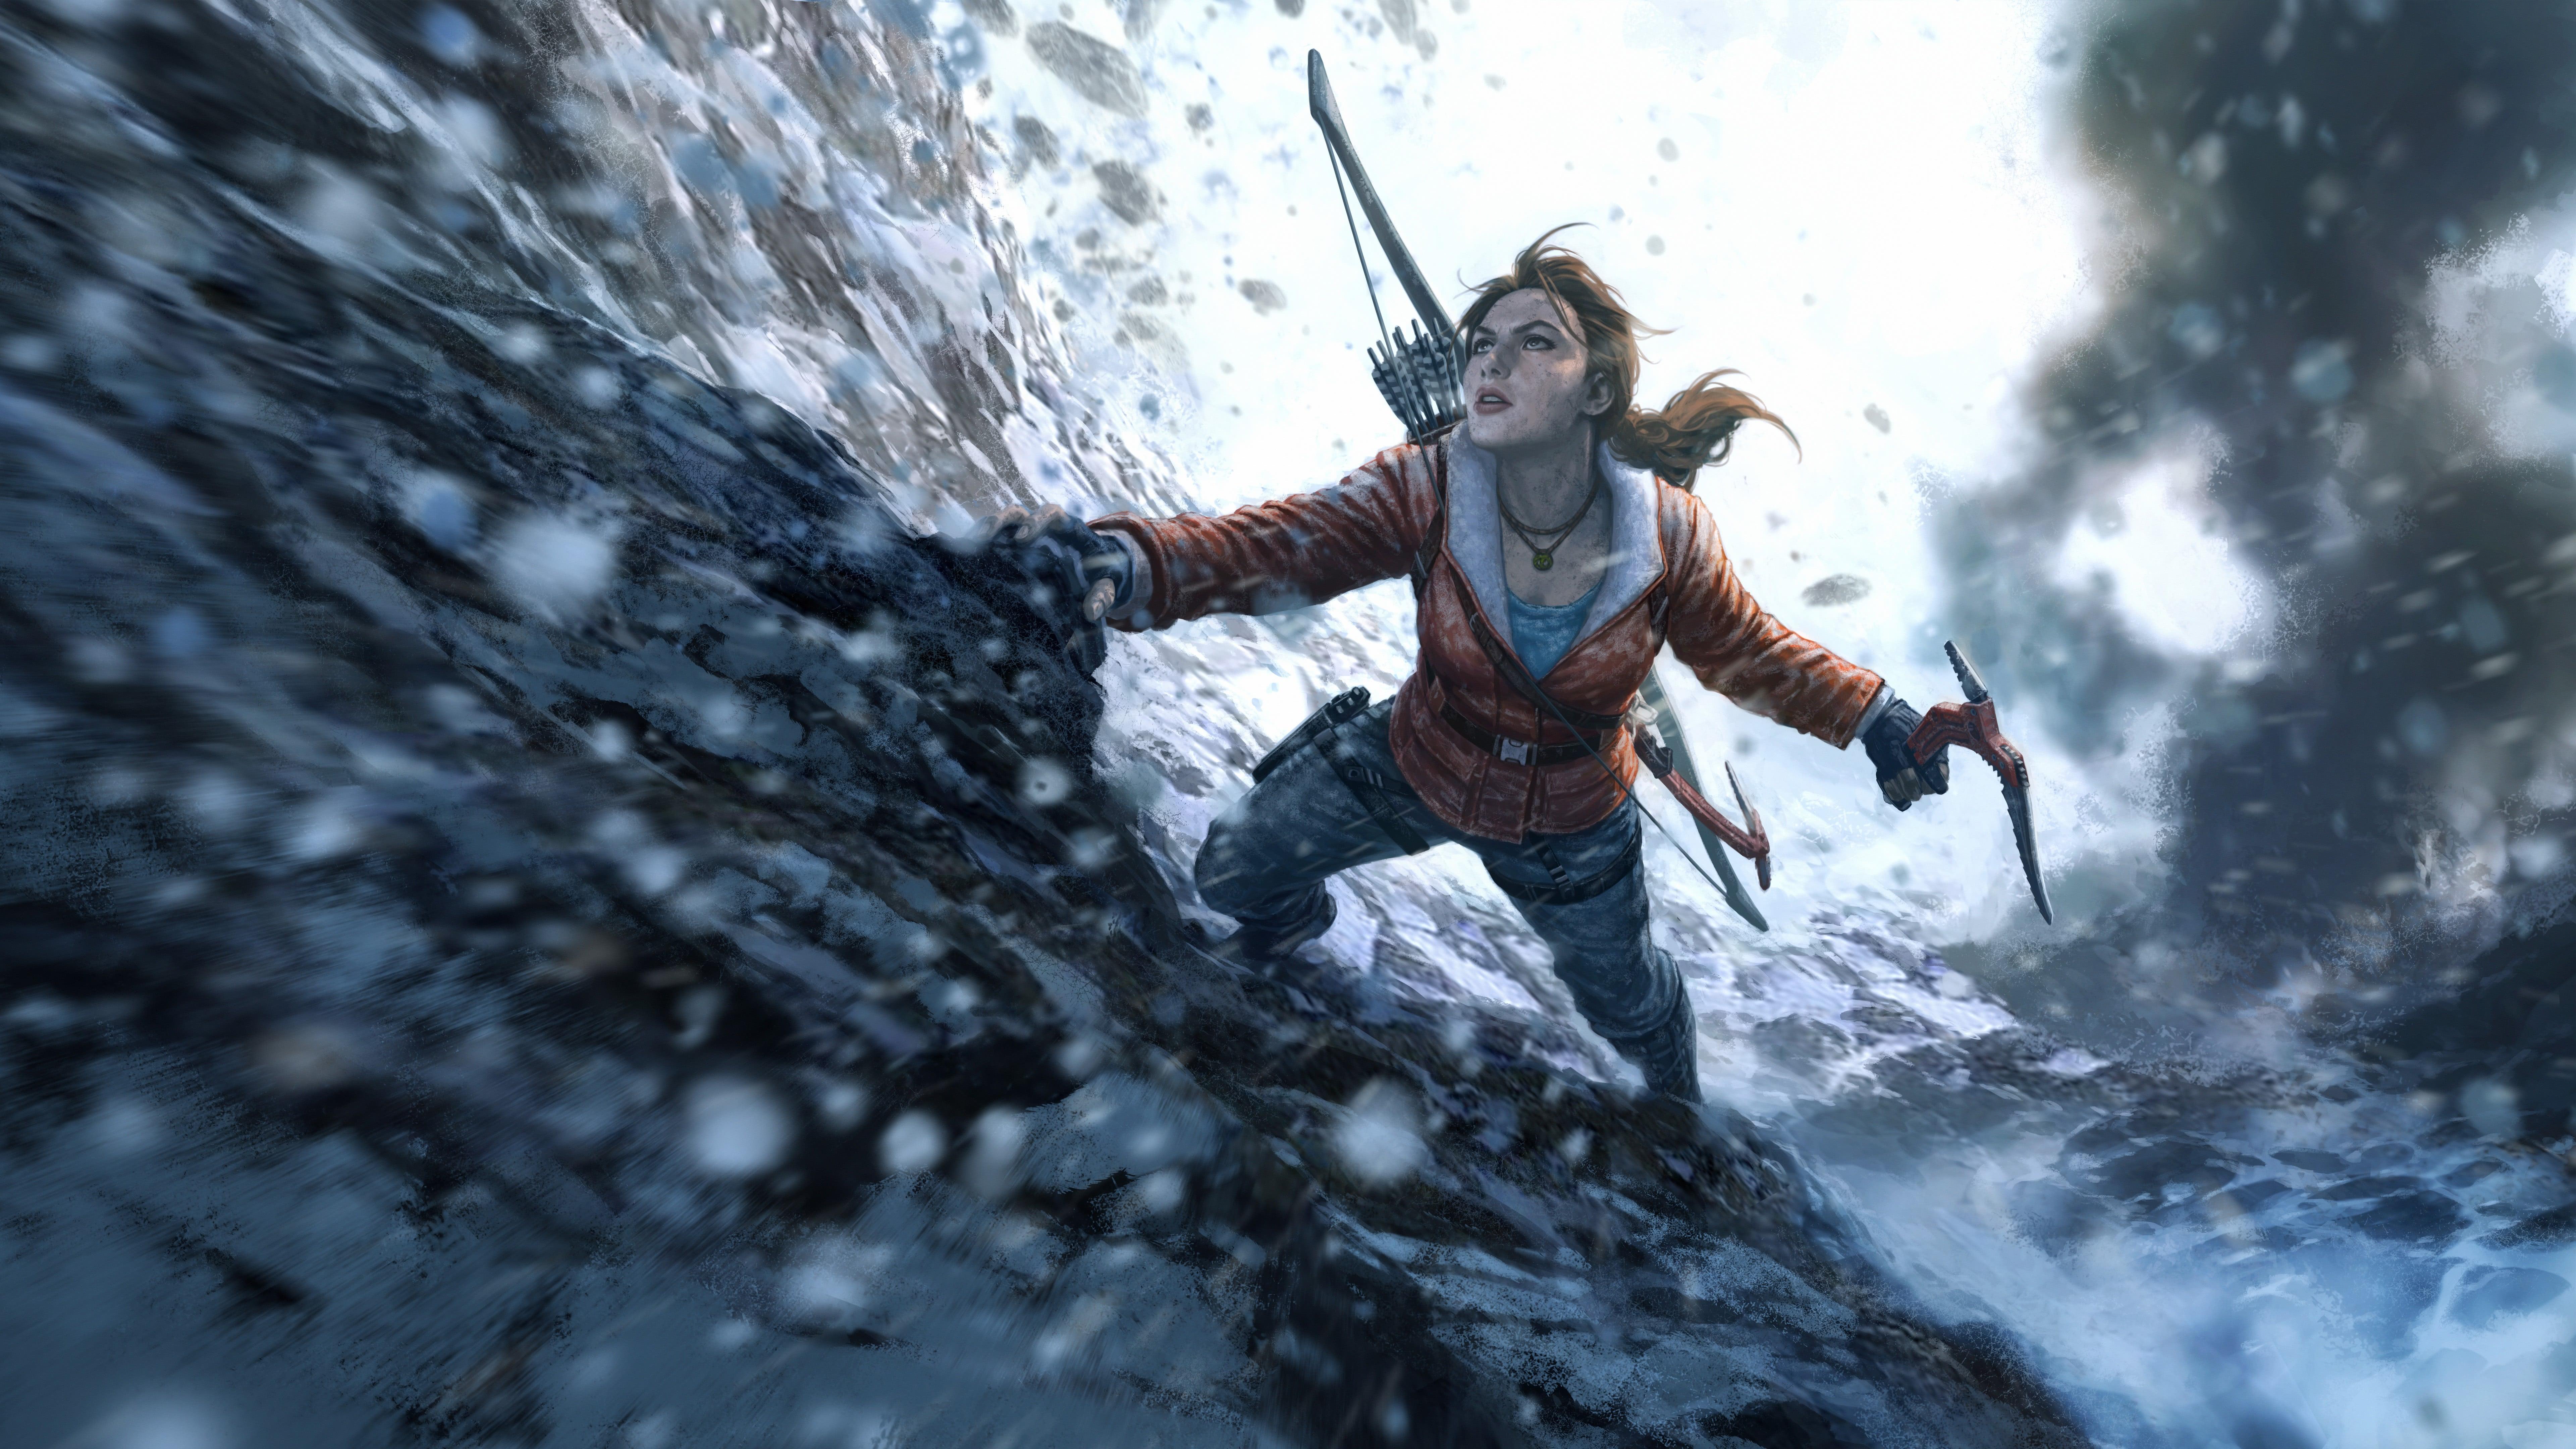 32 Tomb Raider Wallpapers On Wallpapersafari